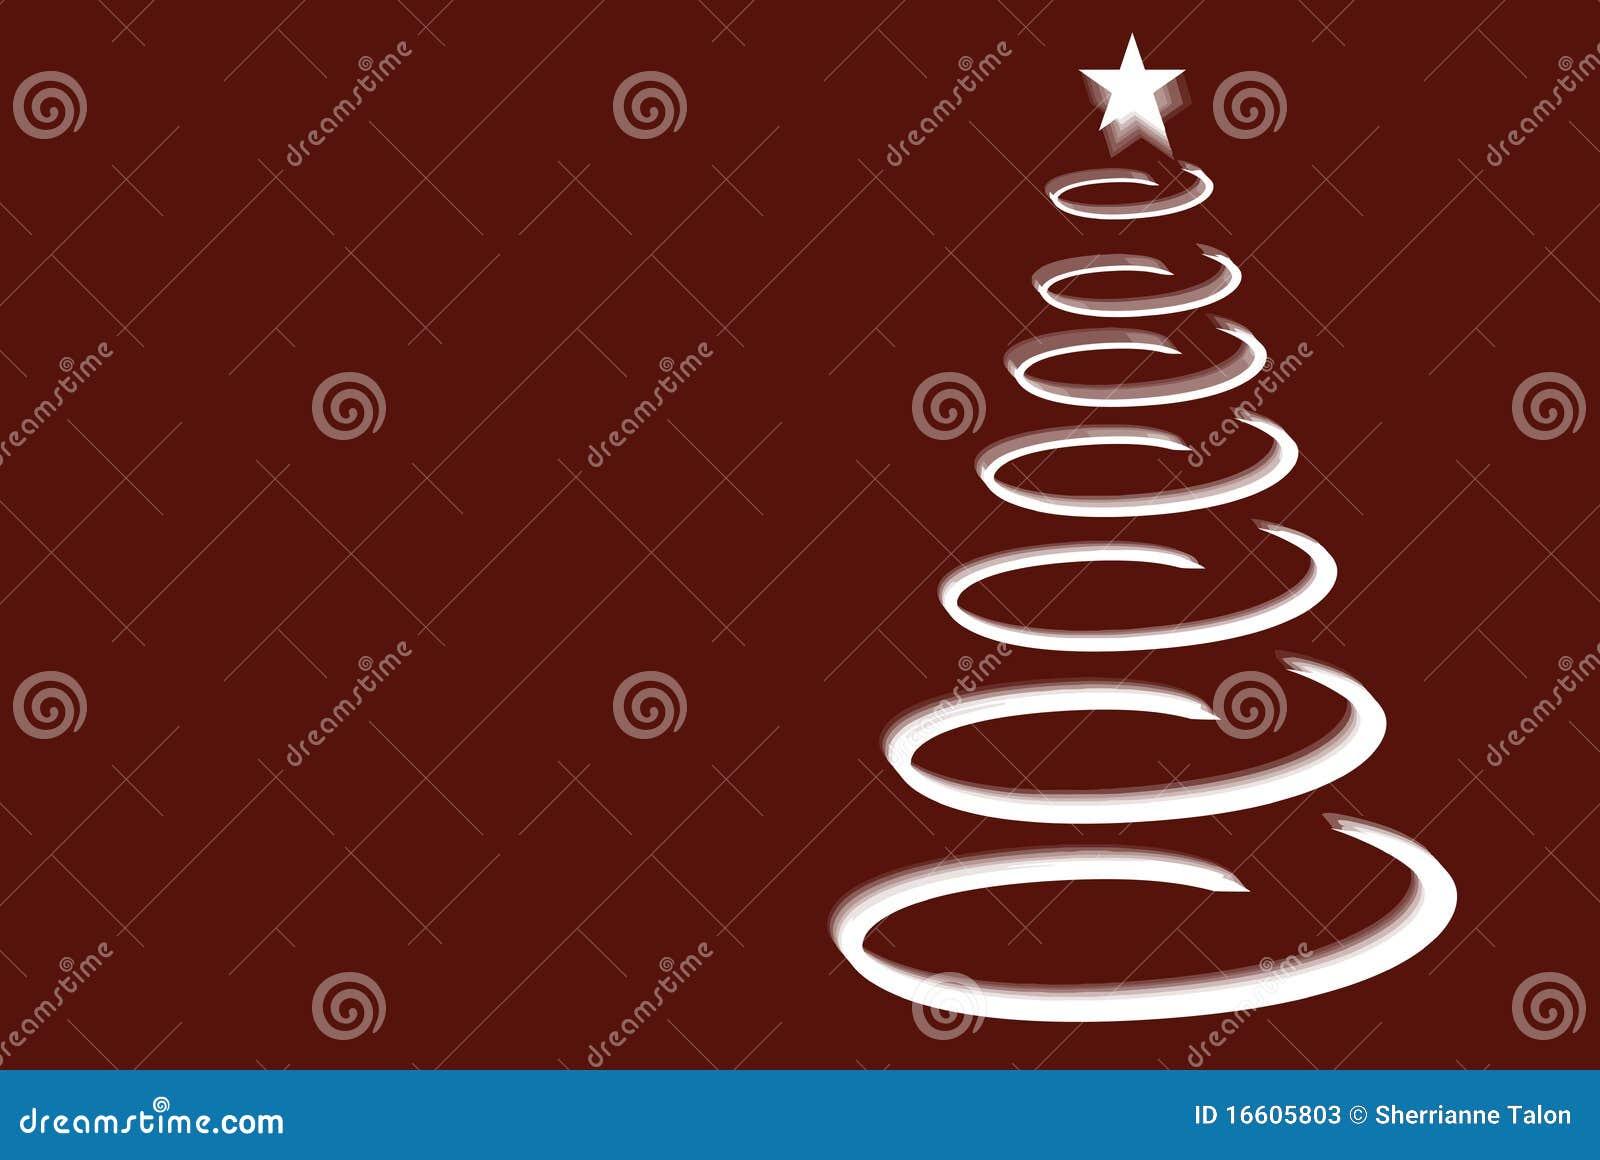 Arbre de Noël spiralé